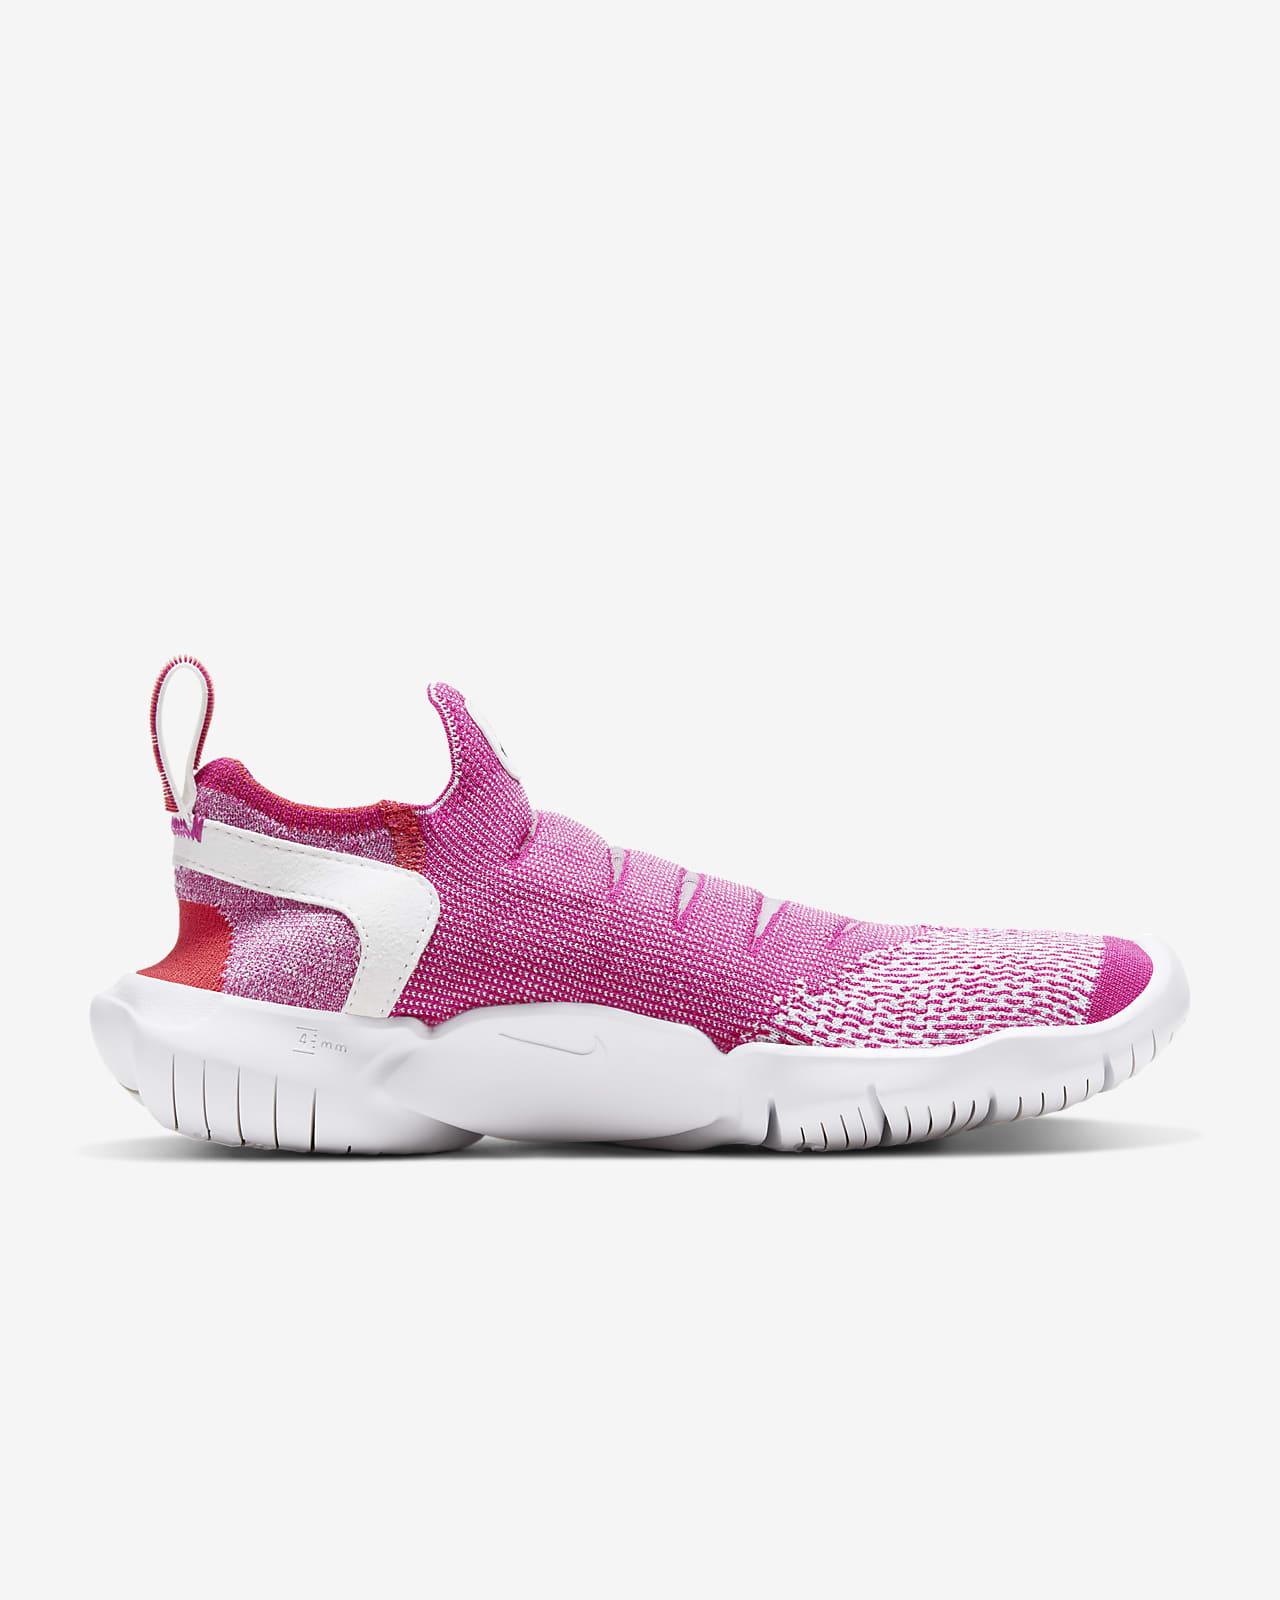 Chaussure de running Nike Free RN Flyknit 3.0 2020 pour Femme